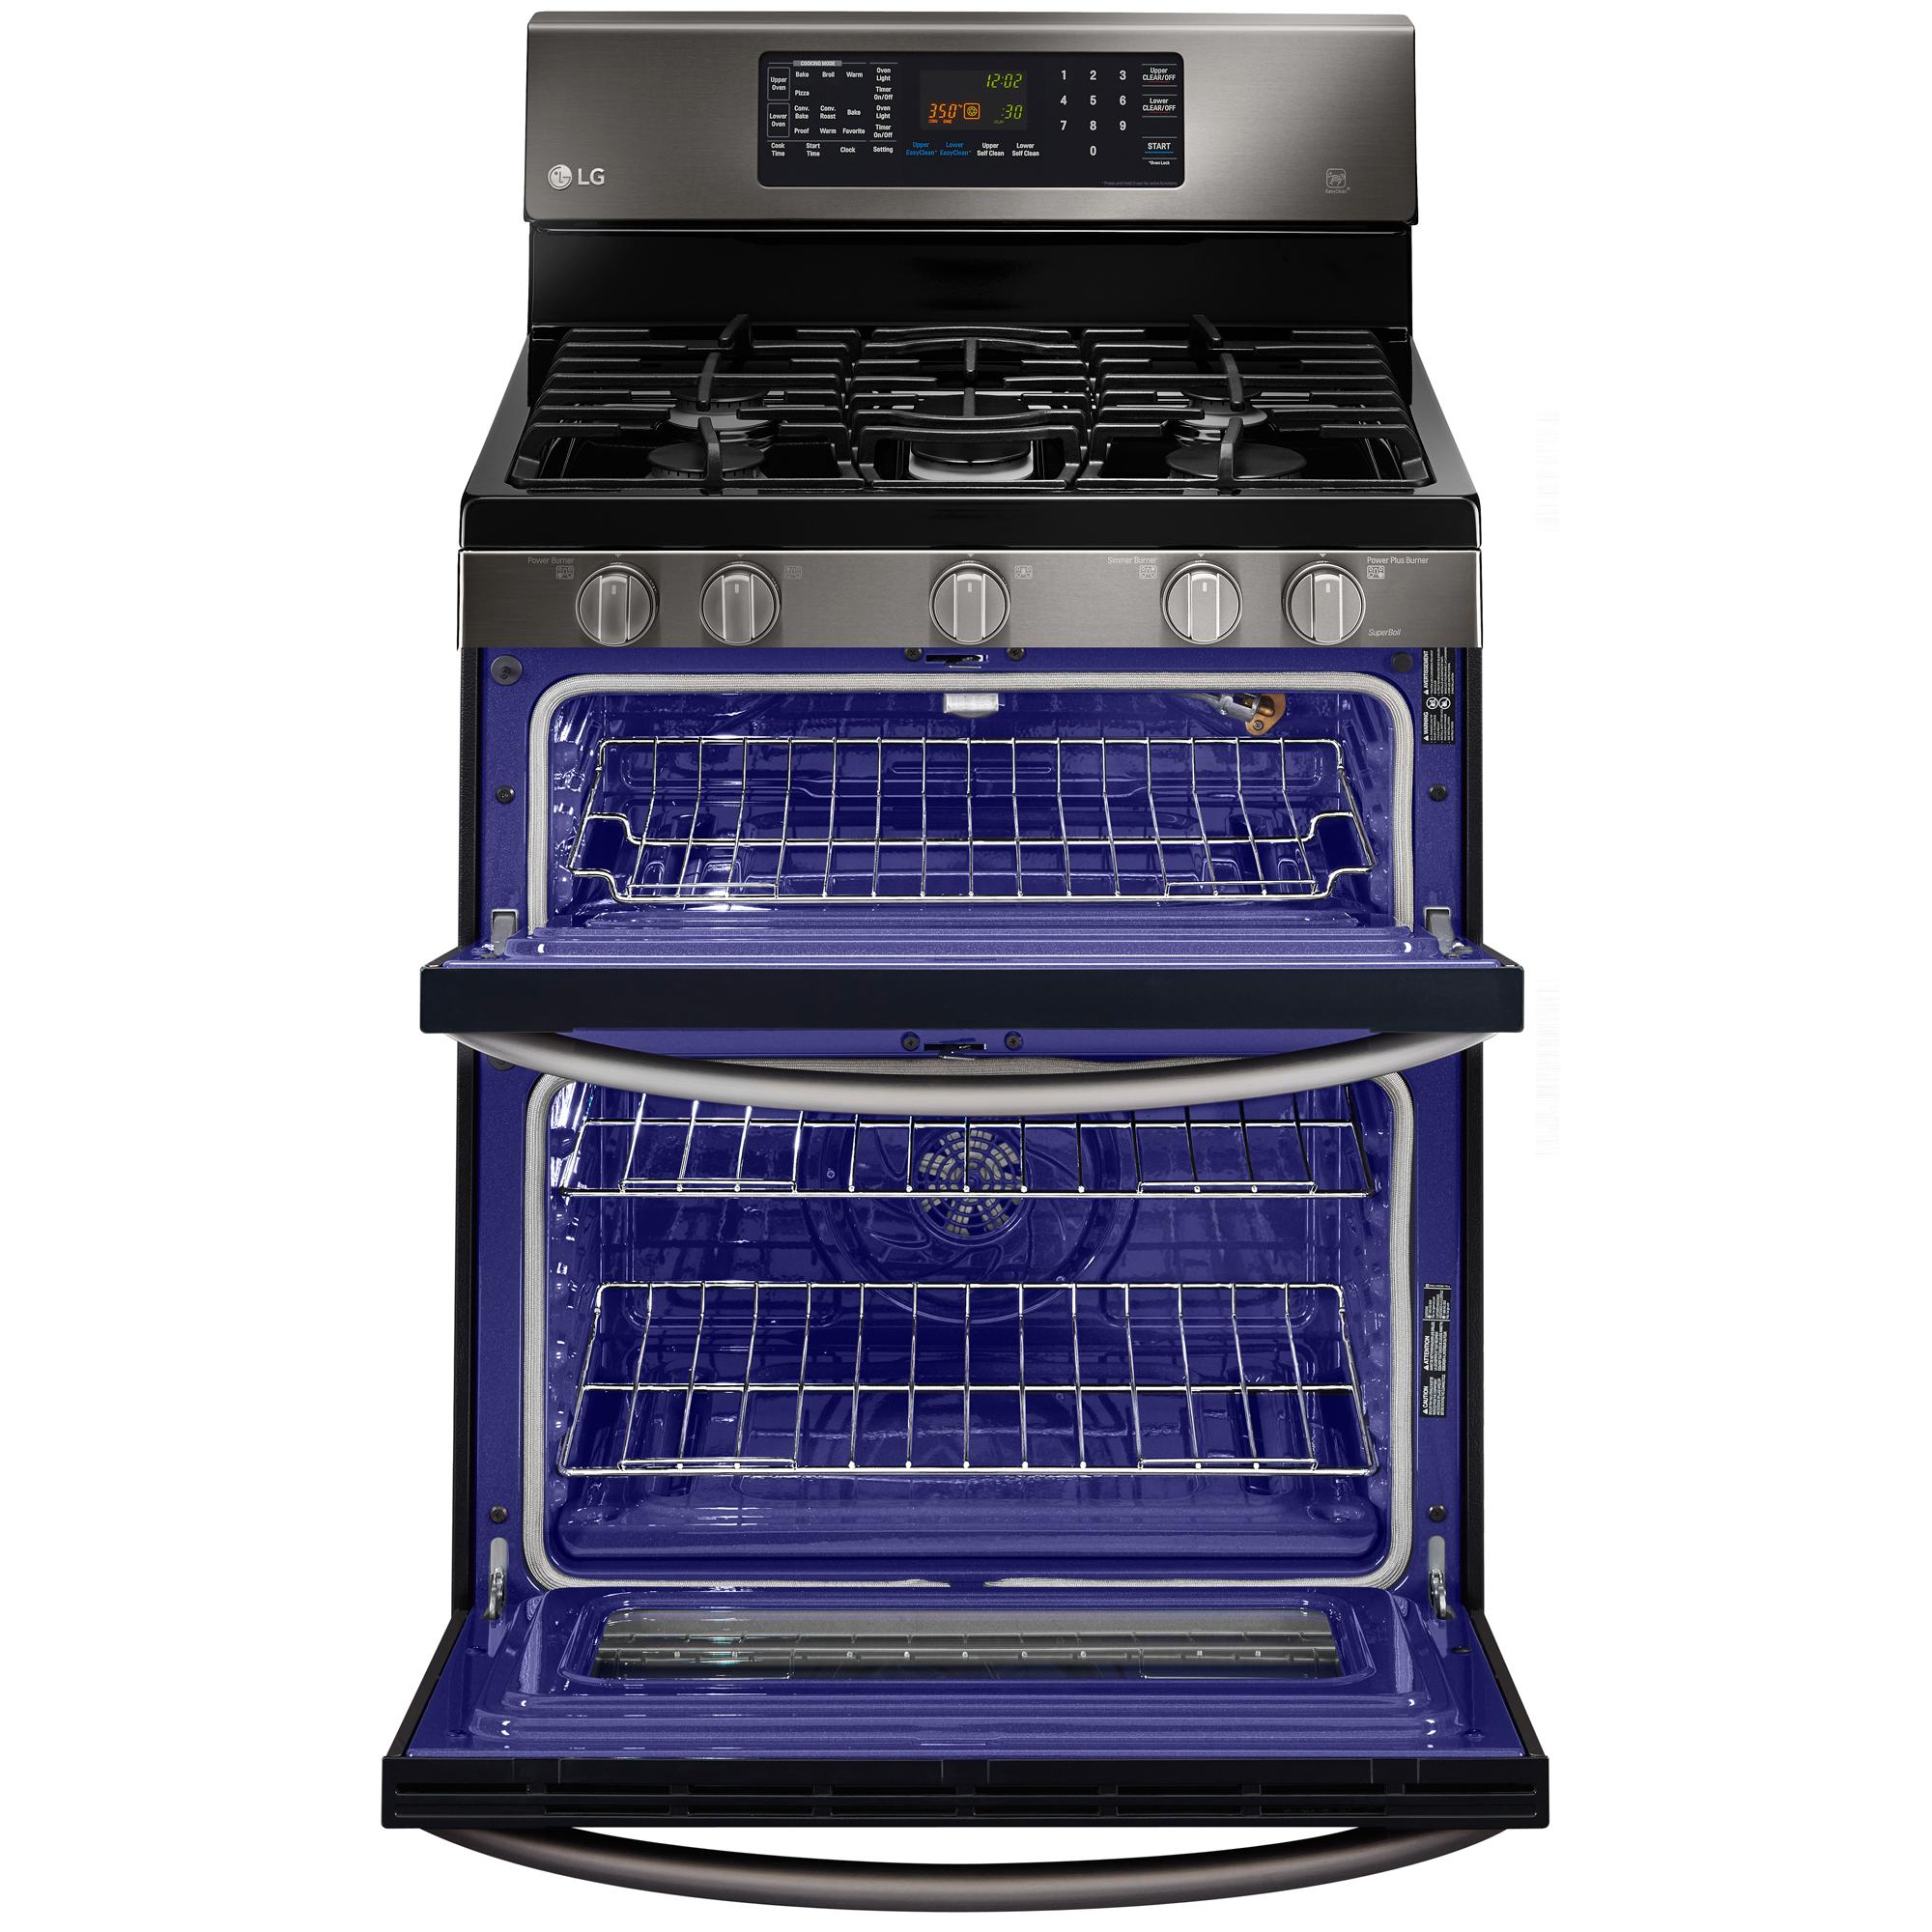 LG LDG3036BD 6.1 cu. ft. Double-Oven Gas Range w/EasyClean™ - Black Stainless